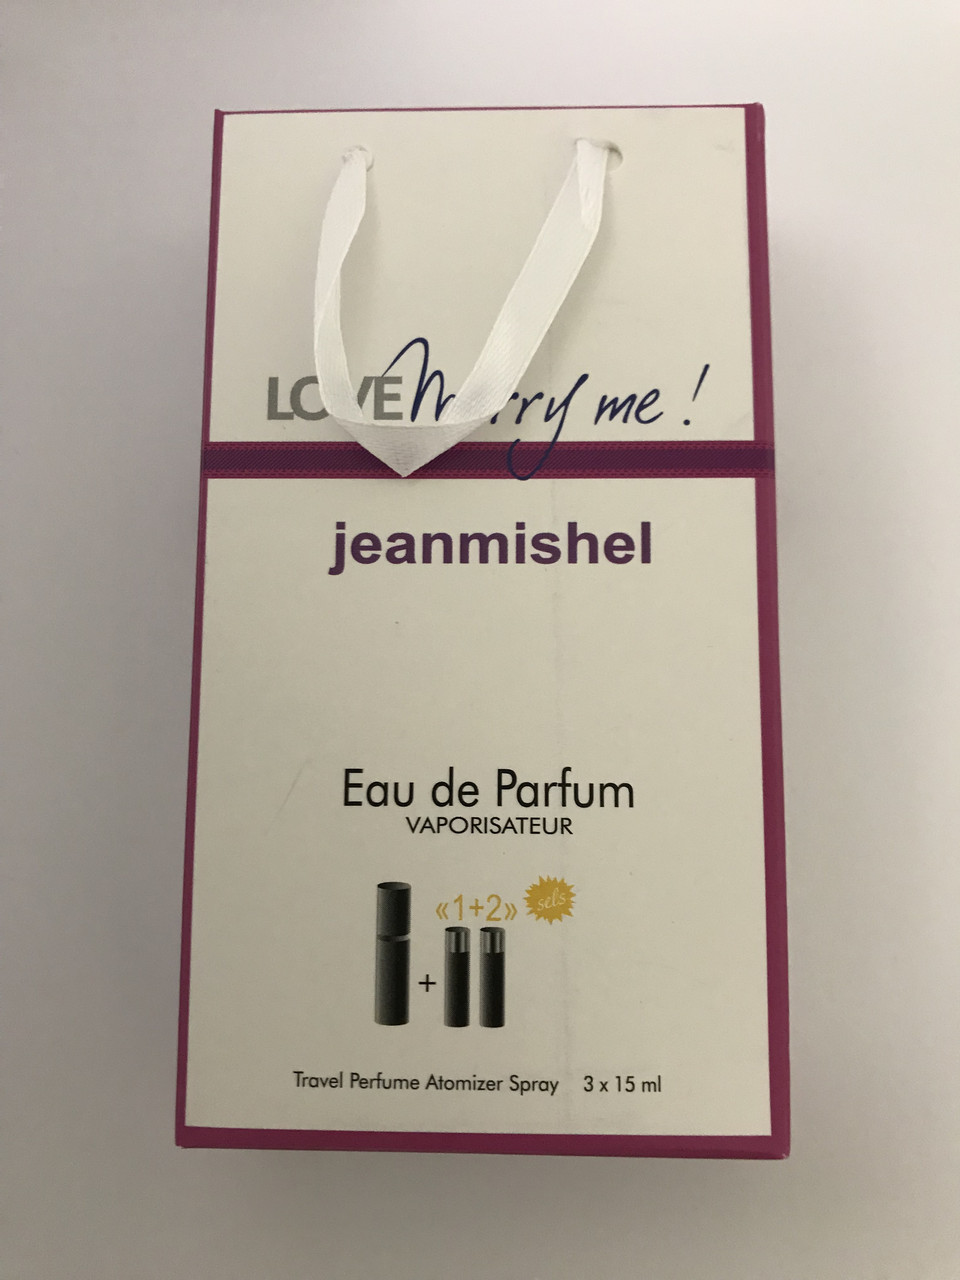 Мини парфюм в подарочной упаковке jeanmishel loveMerri Me 45мл